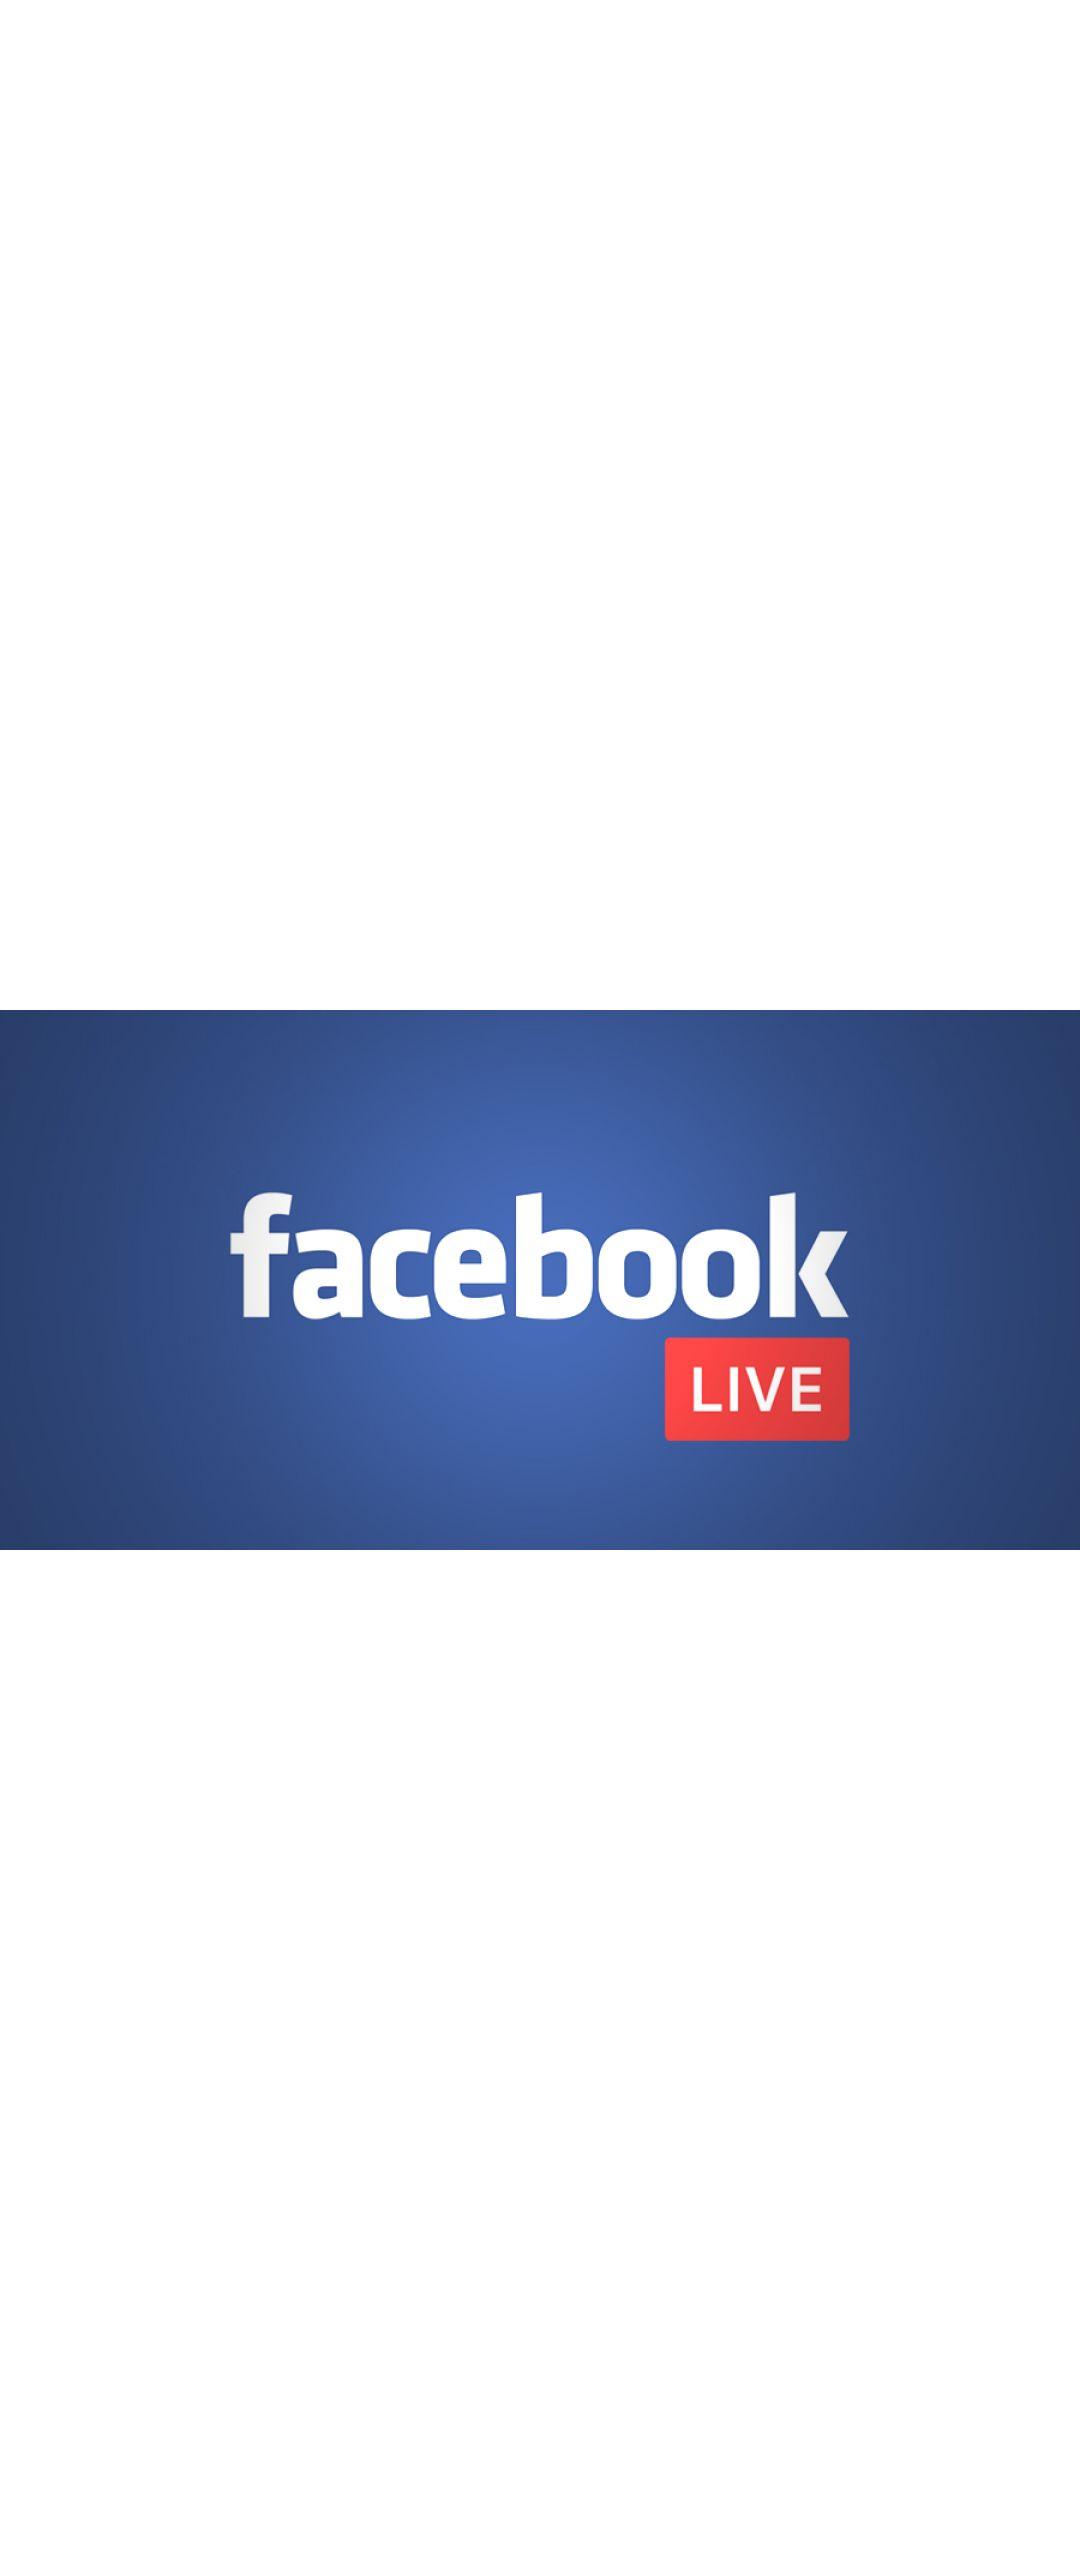 Facebook Live ya permite compartir la pantalla de tu computador